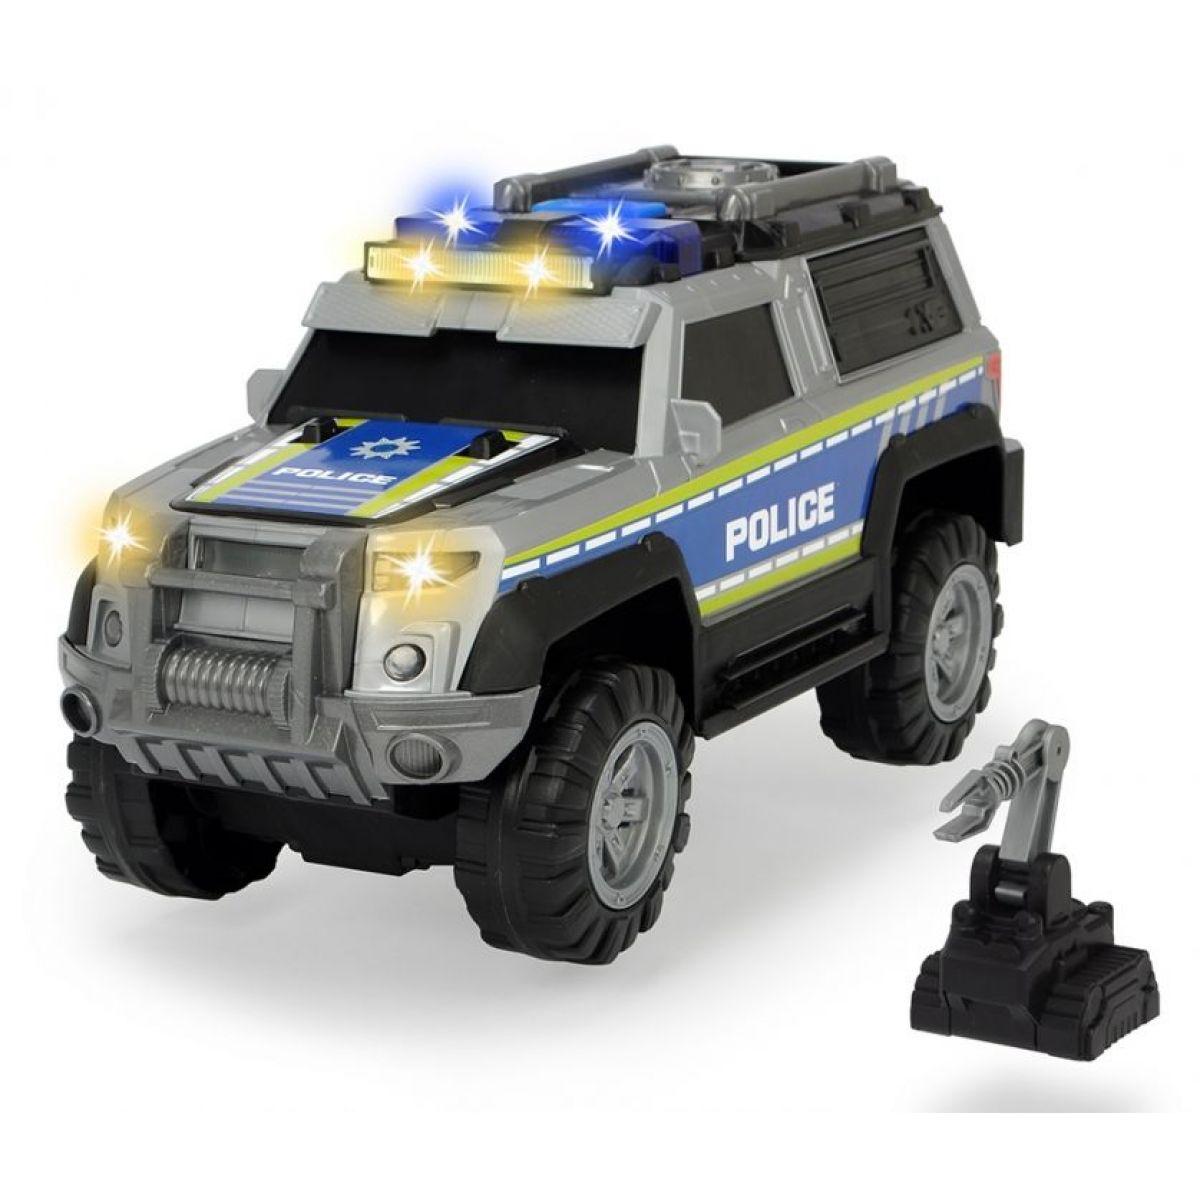 Dickie Action Series Polícia Auto 30cm